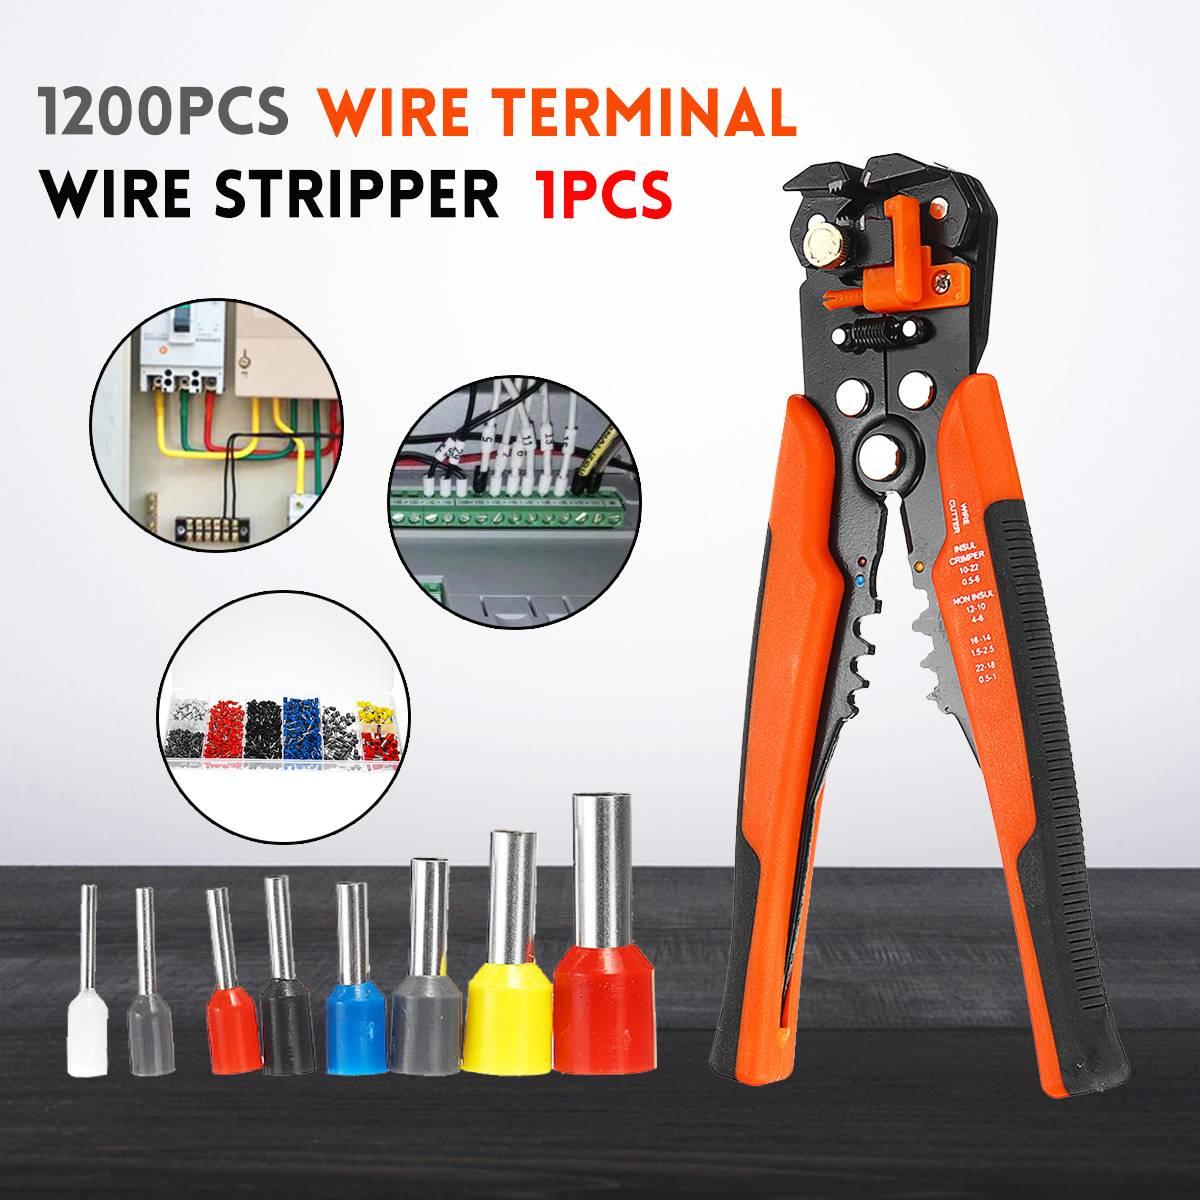 Ev Dekorasyonu'ten Terminaller'de 1201 adet kablo tel terminali bakır kıvrım konektörü Multifucioal el Crimper pense sıkma aracı Set terminali bağlantı kiti title=